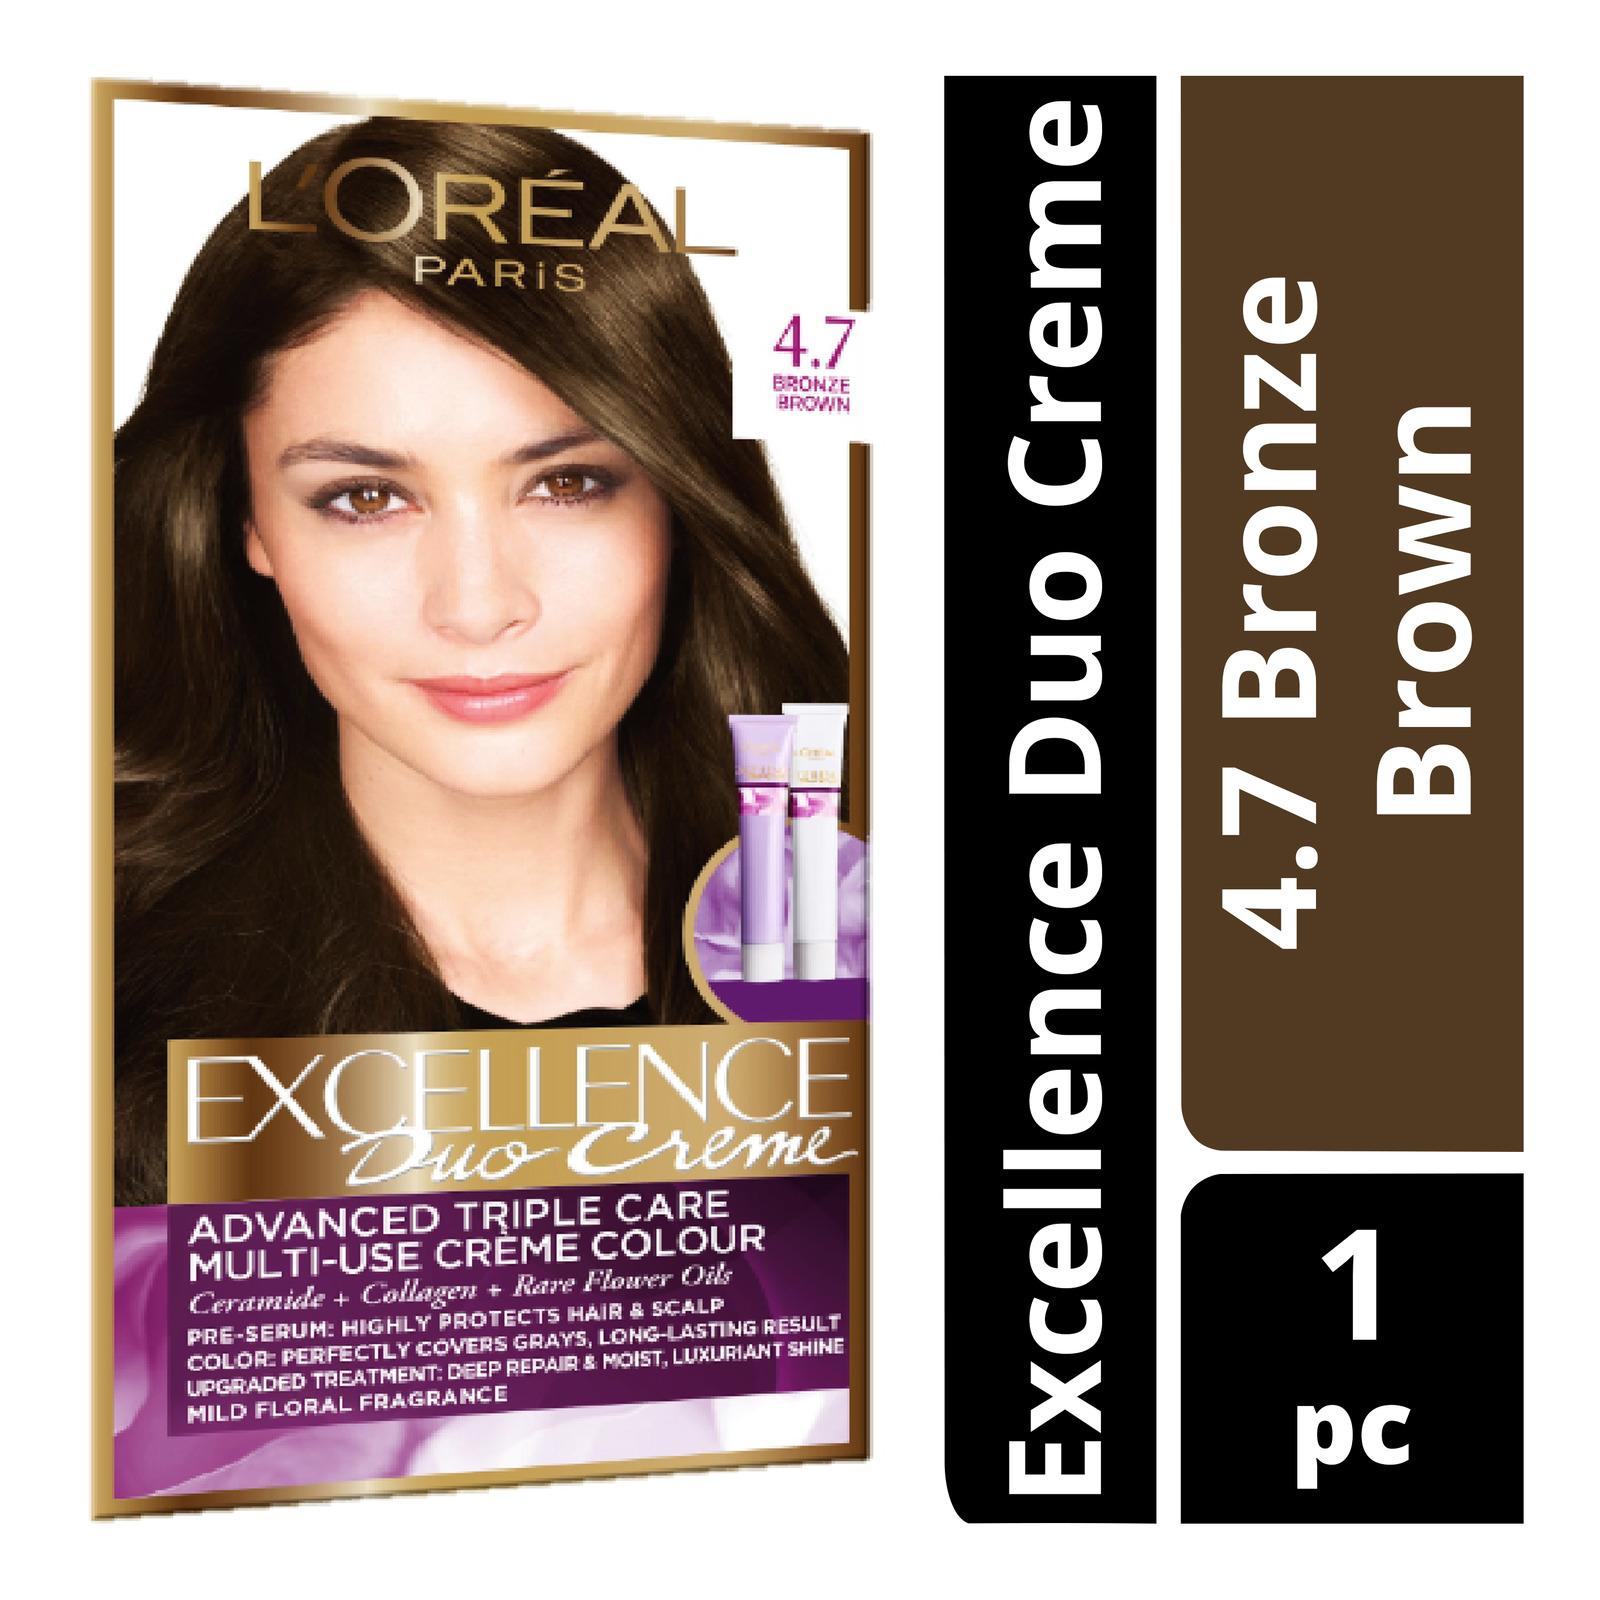 L'Oreal Paris Excellence Duo Creme Hair Dye - 4.7 Bronze Brown